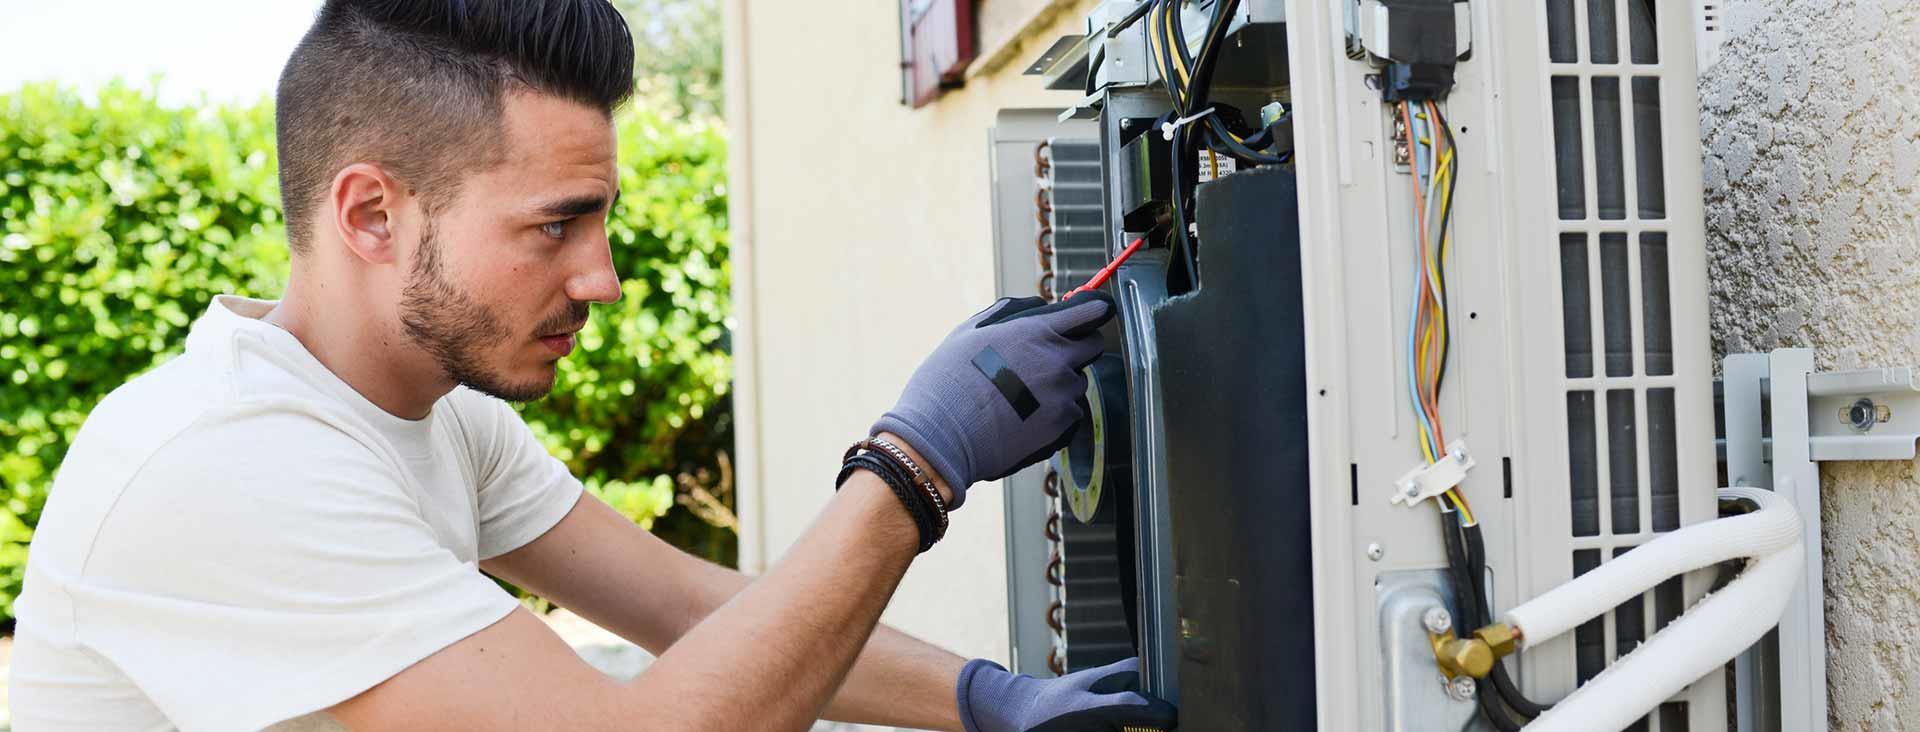 Air Express Heating & Air Conditioning image 3